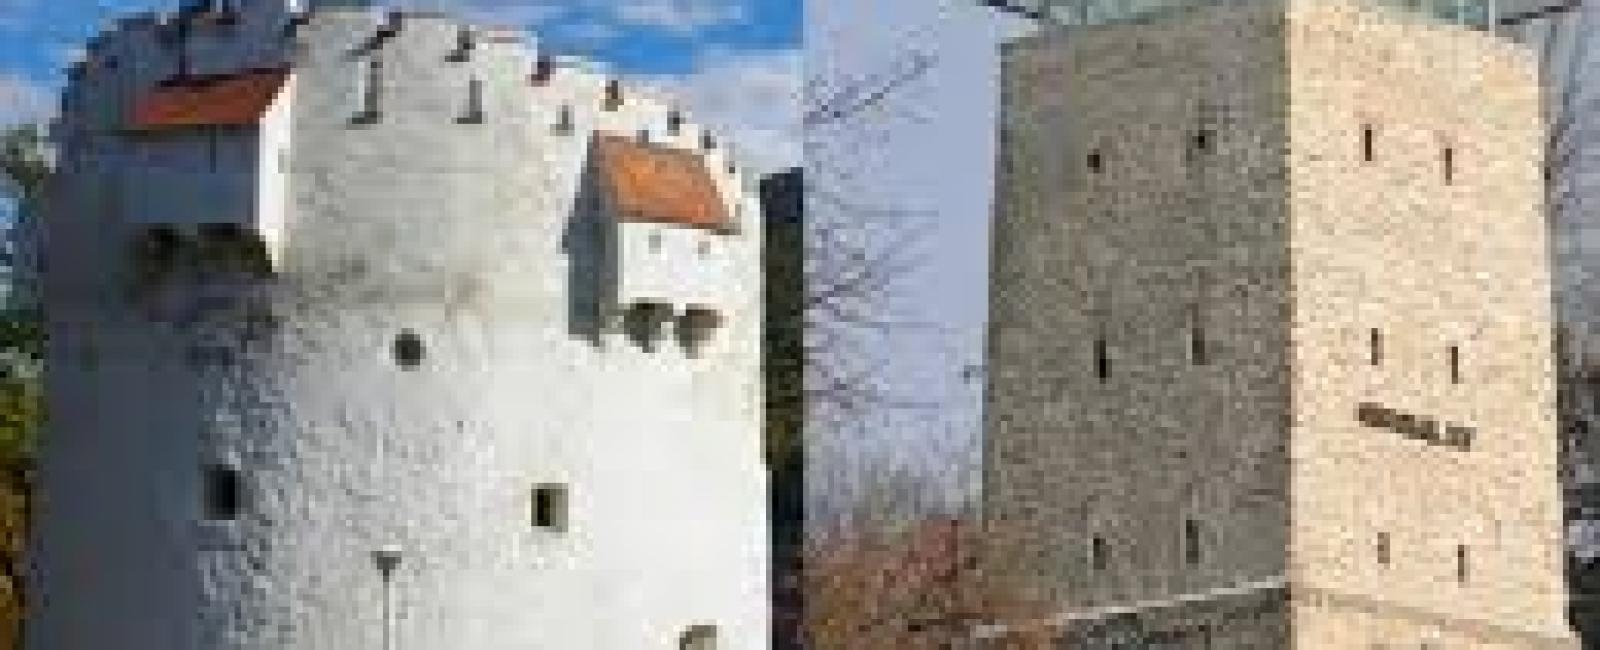 Turnul Alb si Turnul Negru